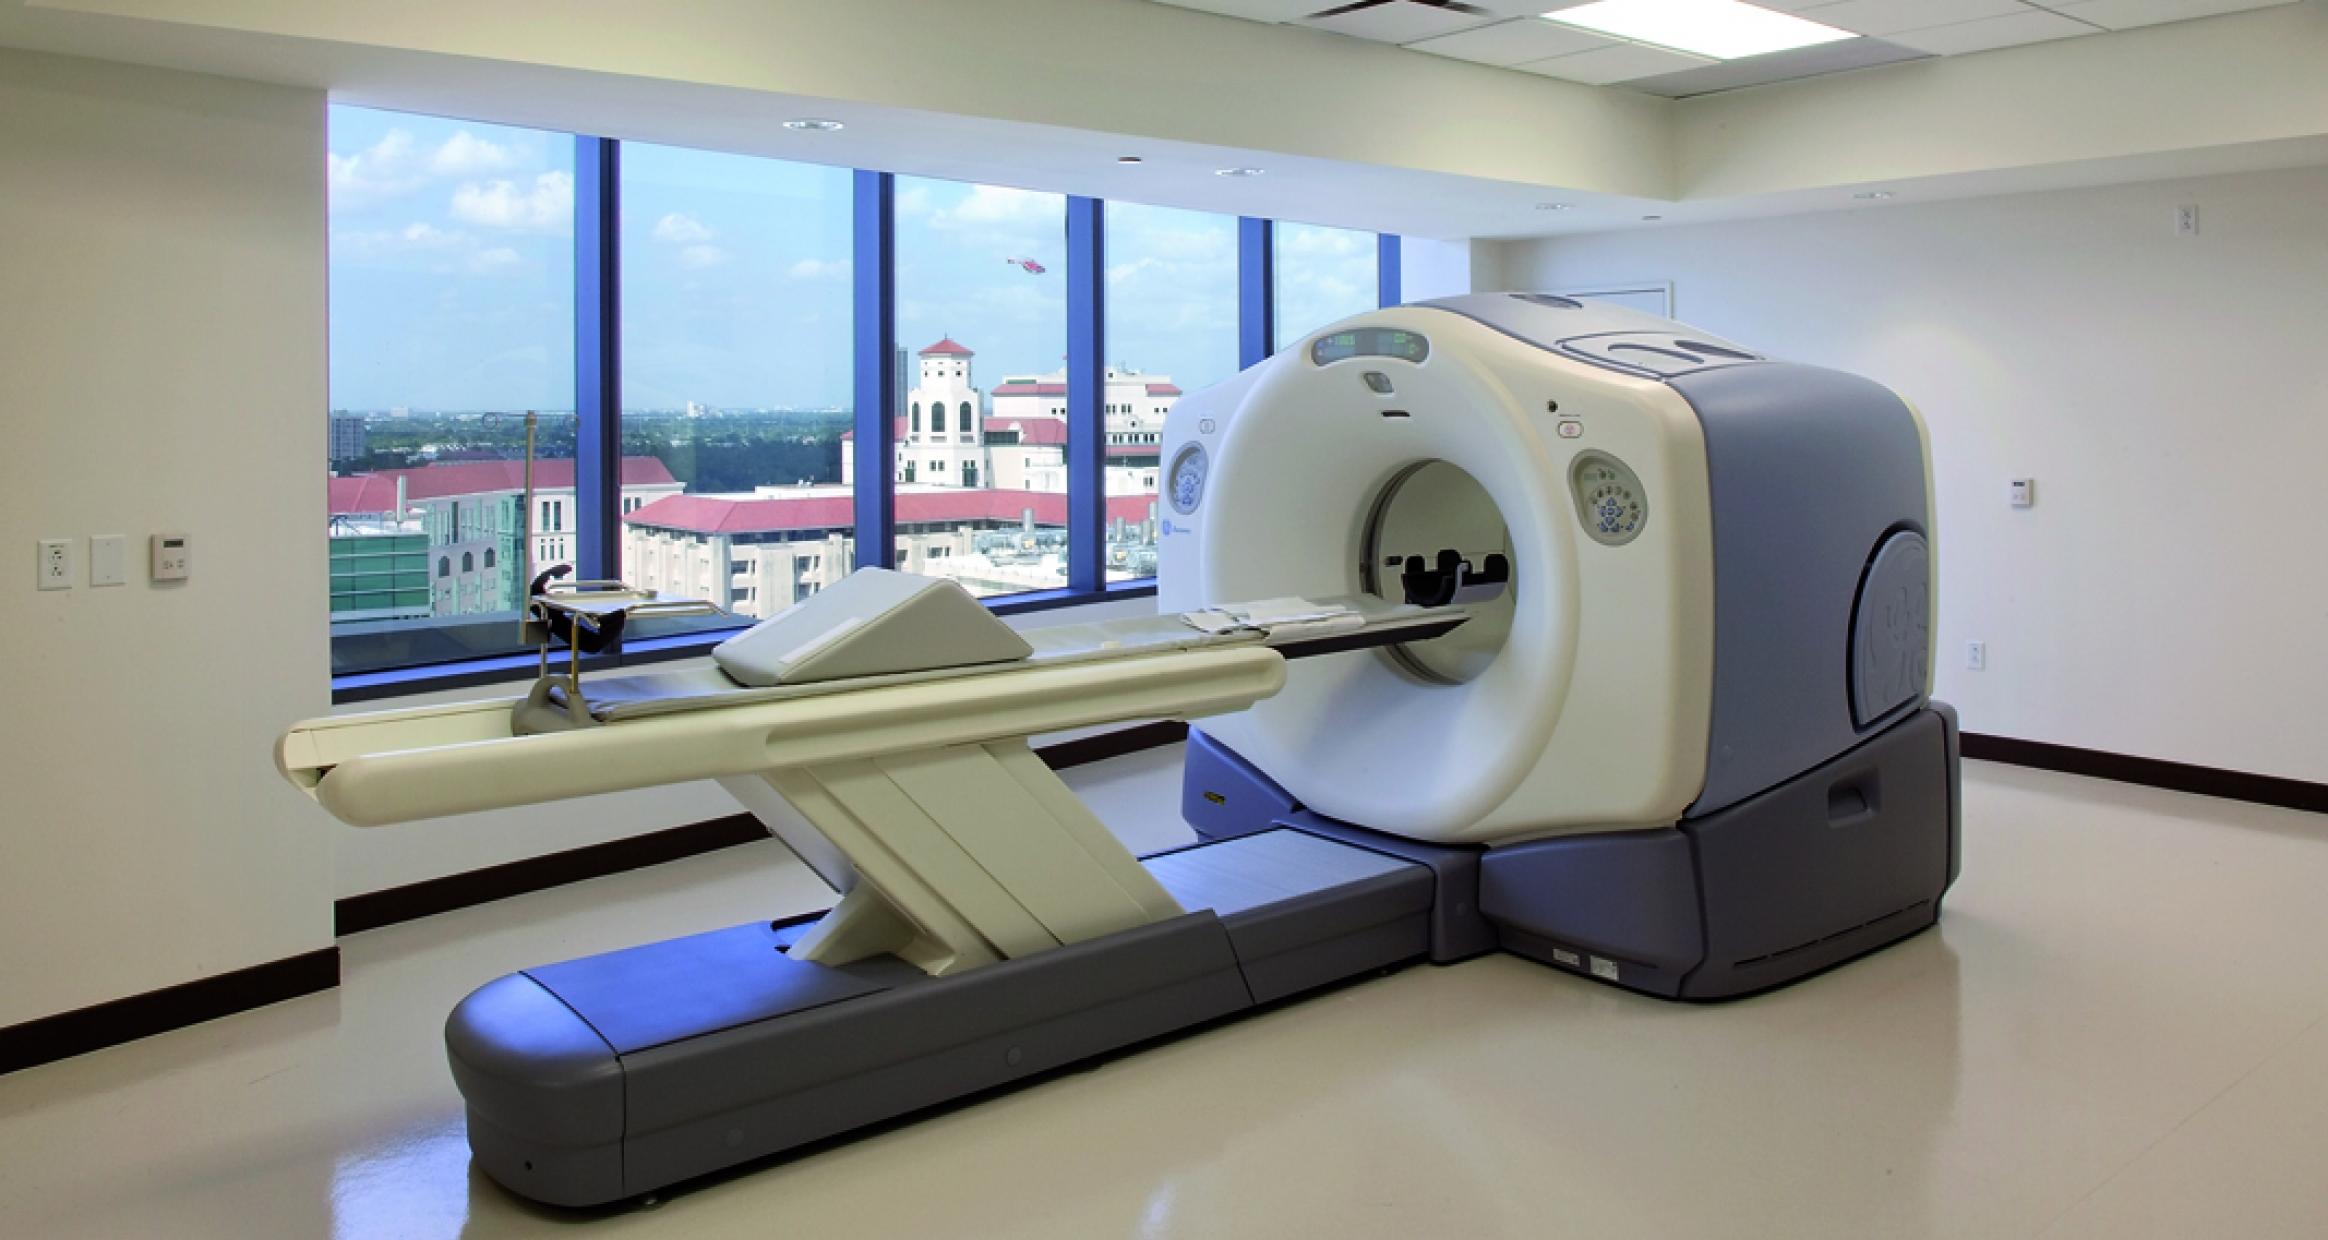 Outpatient Center | EYP